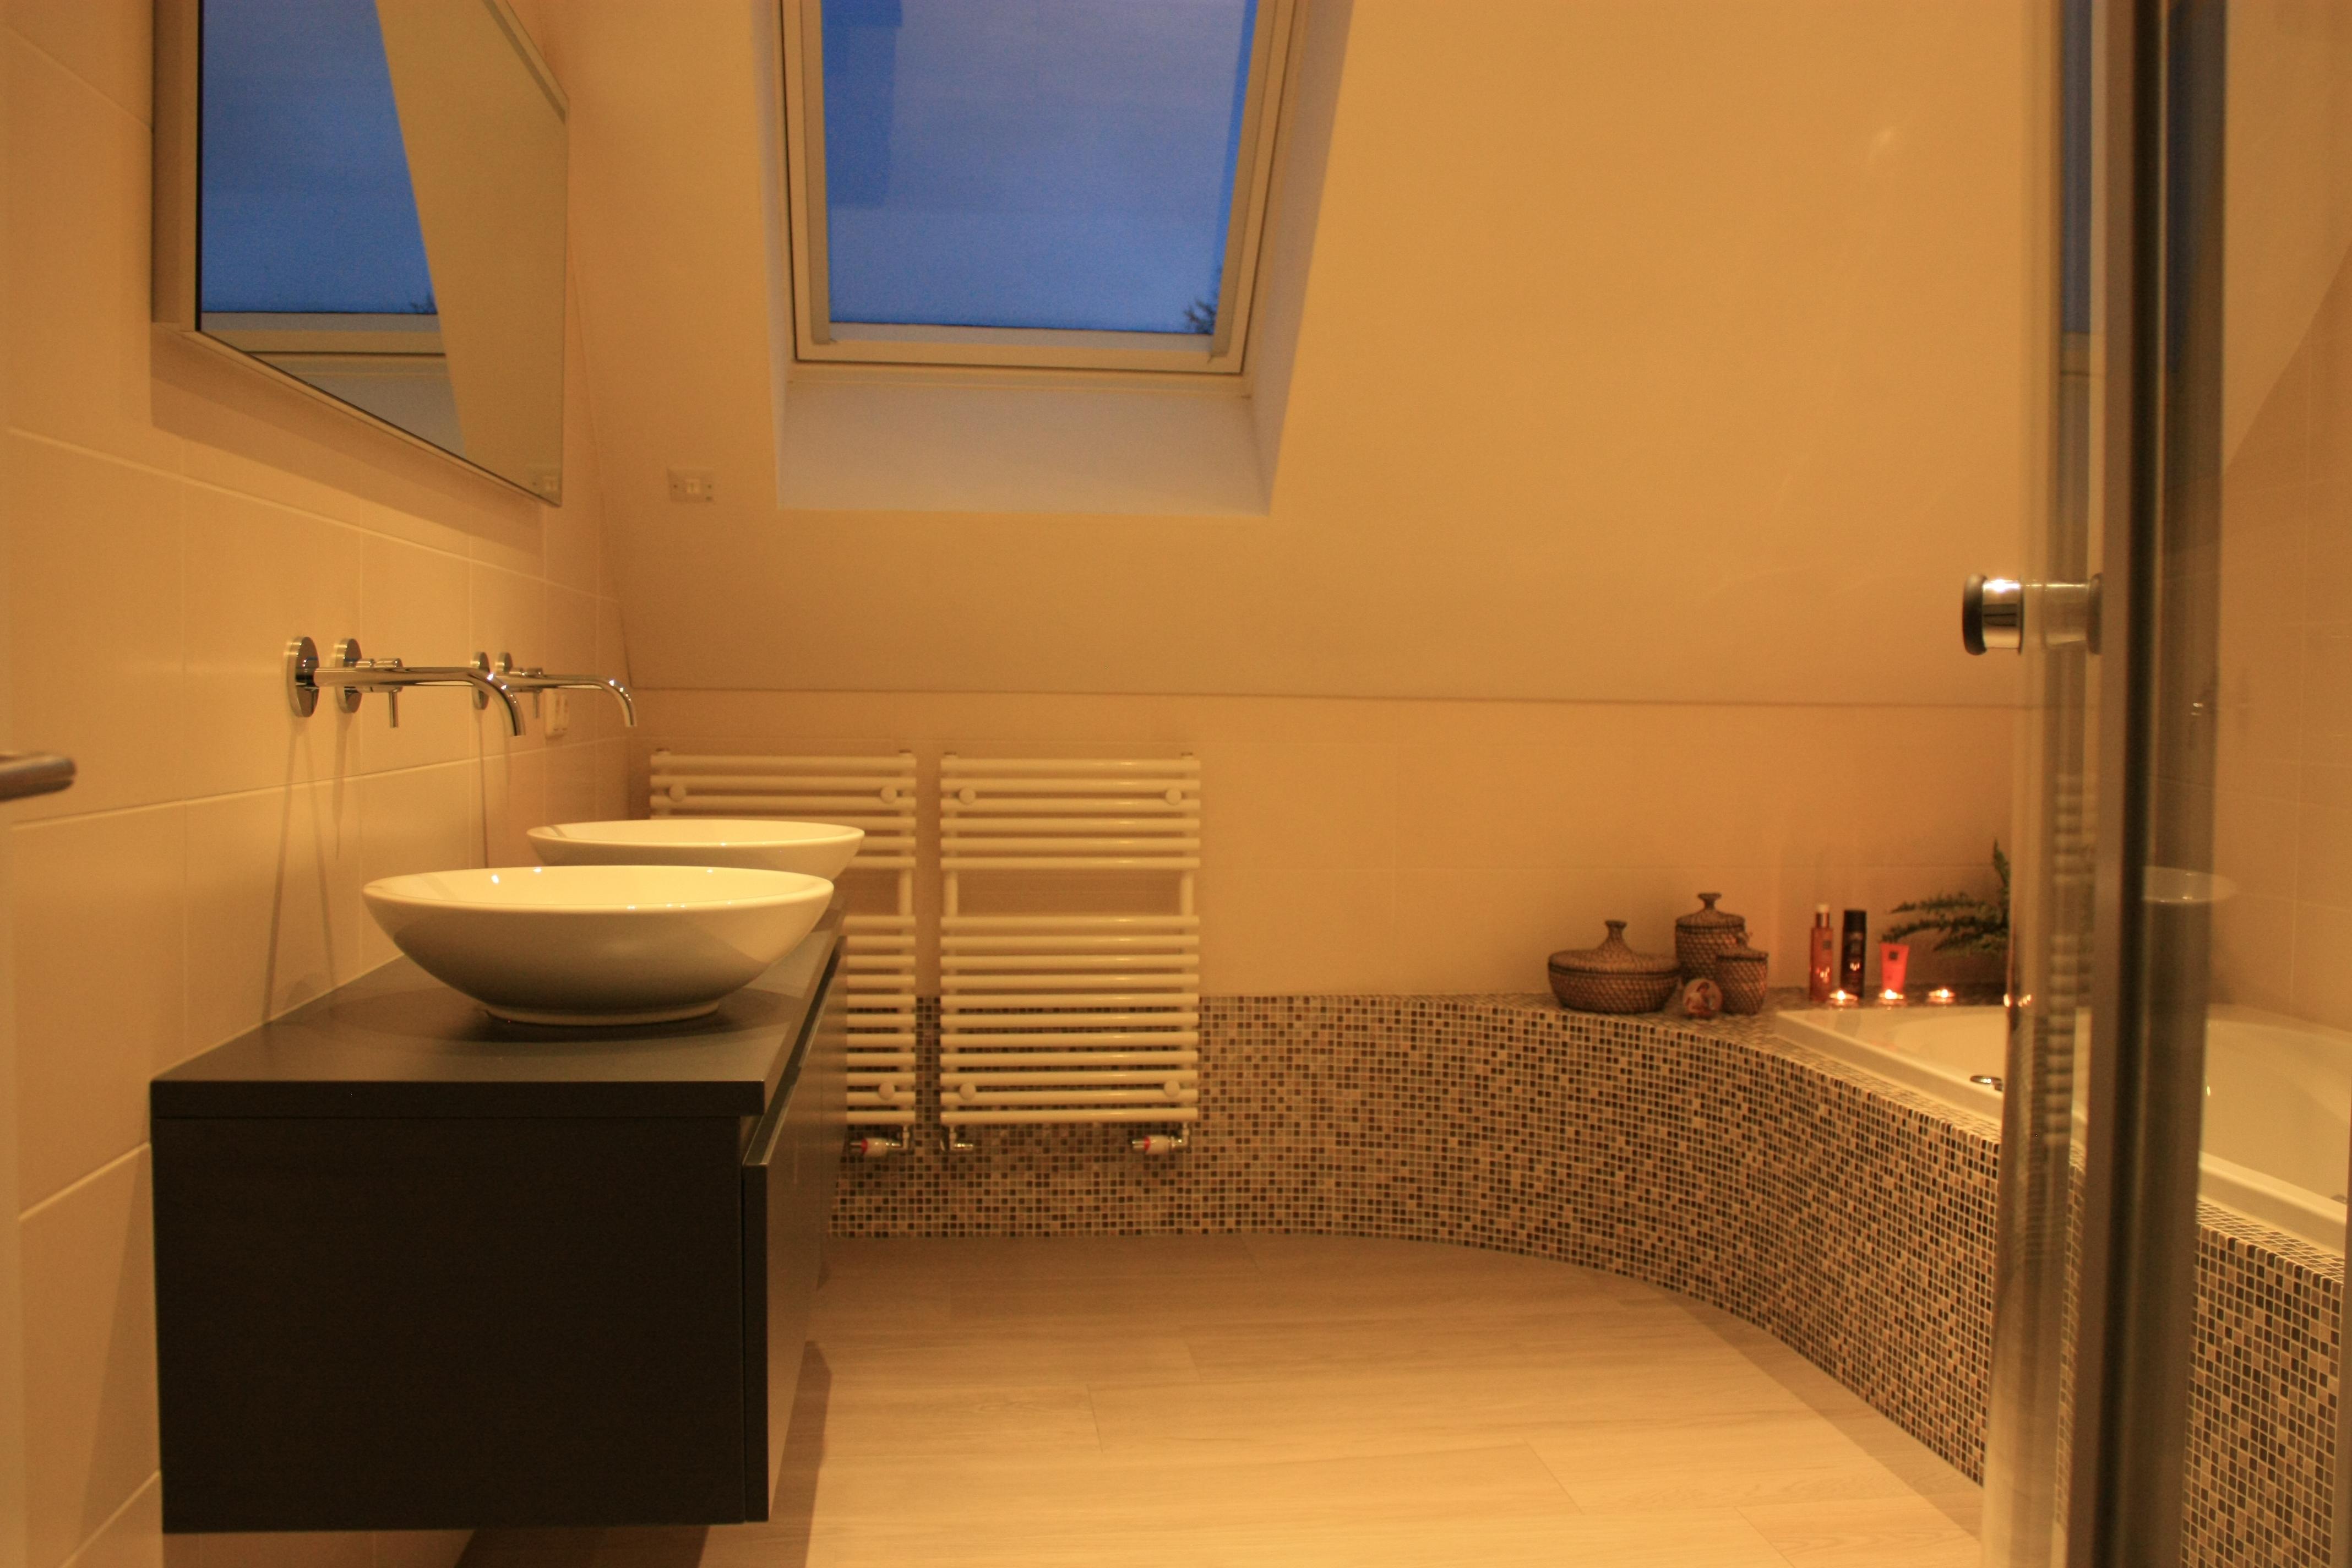 Badkamer - verbouwer.nl